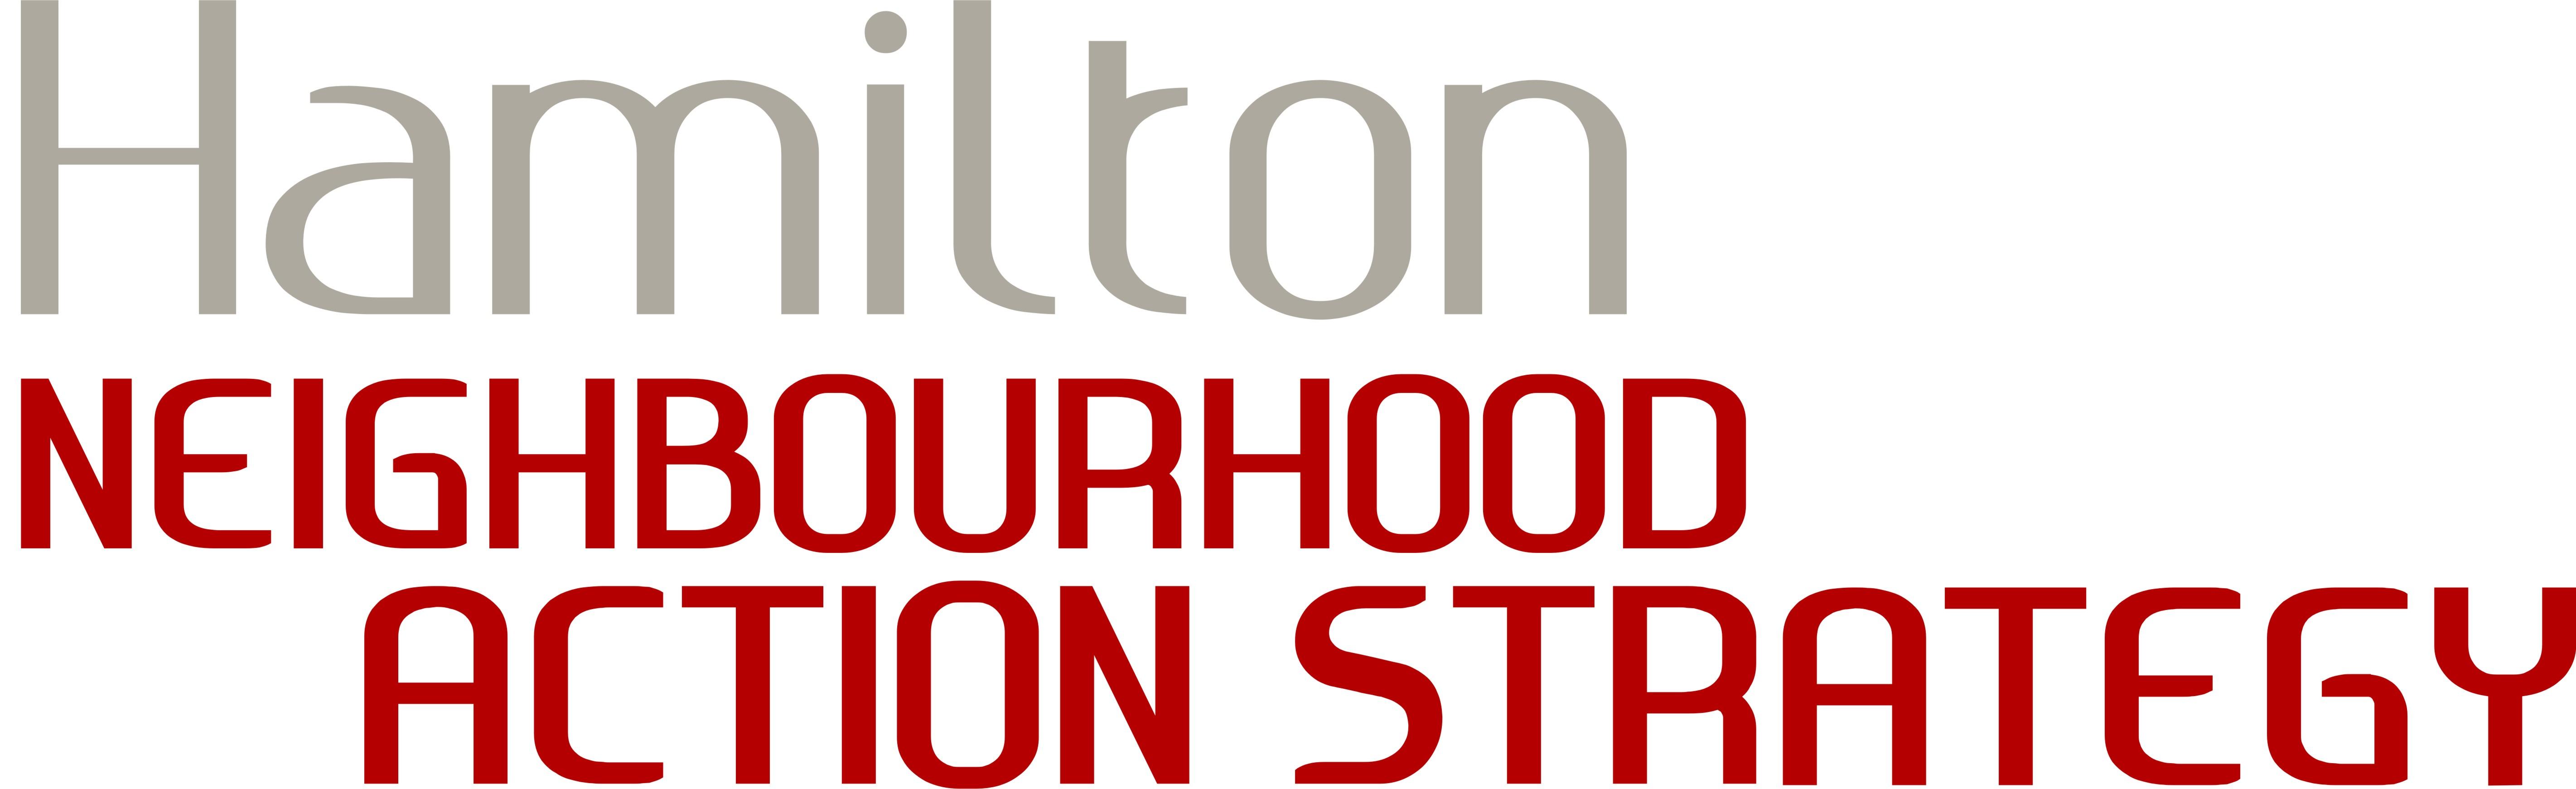 Hamilton_Neighbourhood_Action_Strategy_Logo1.jpg